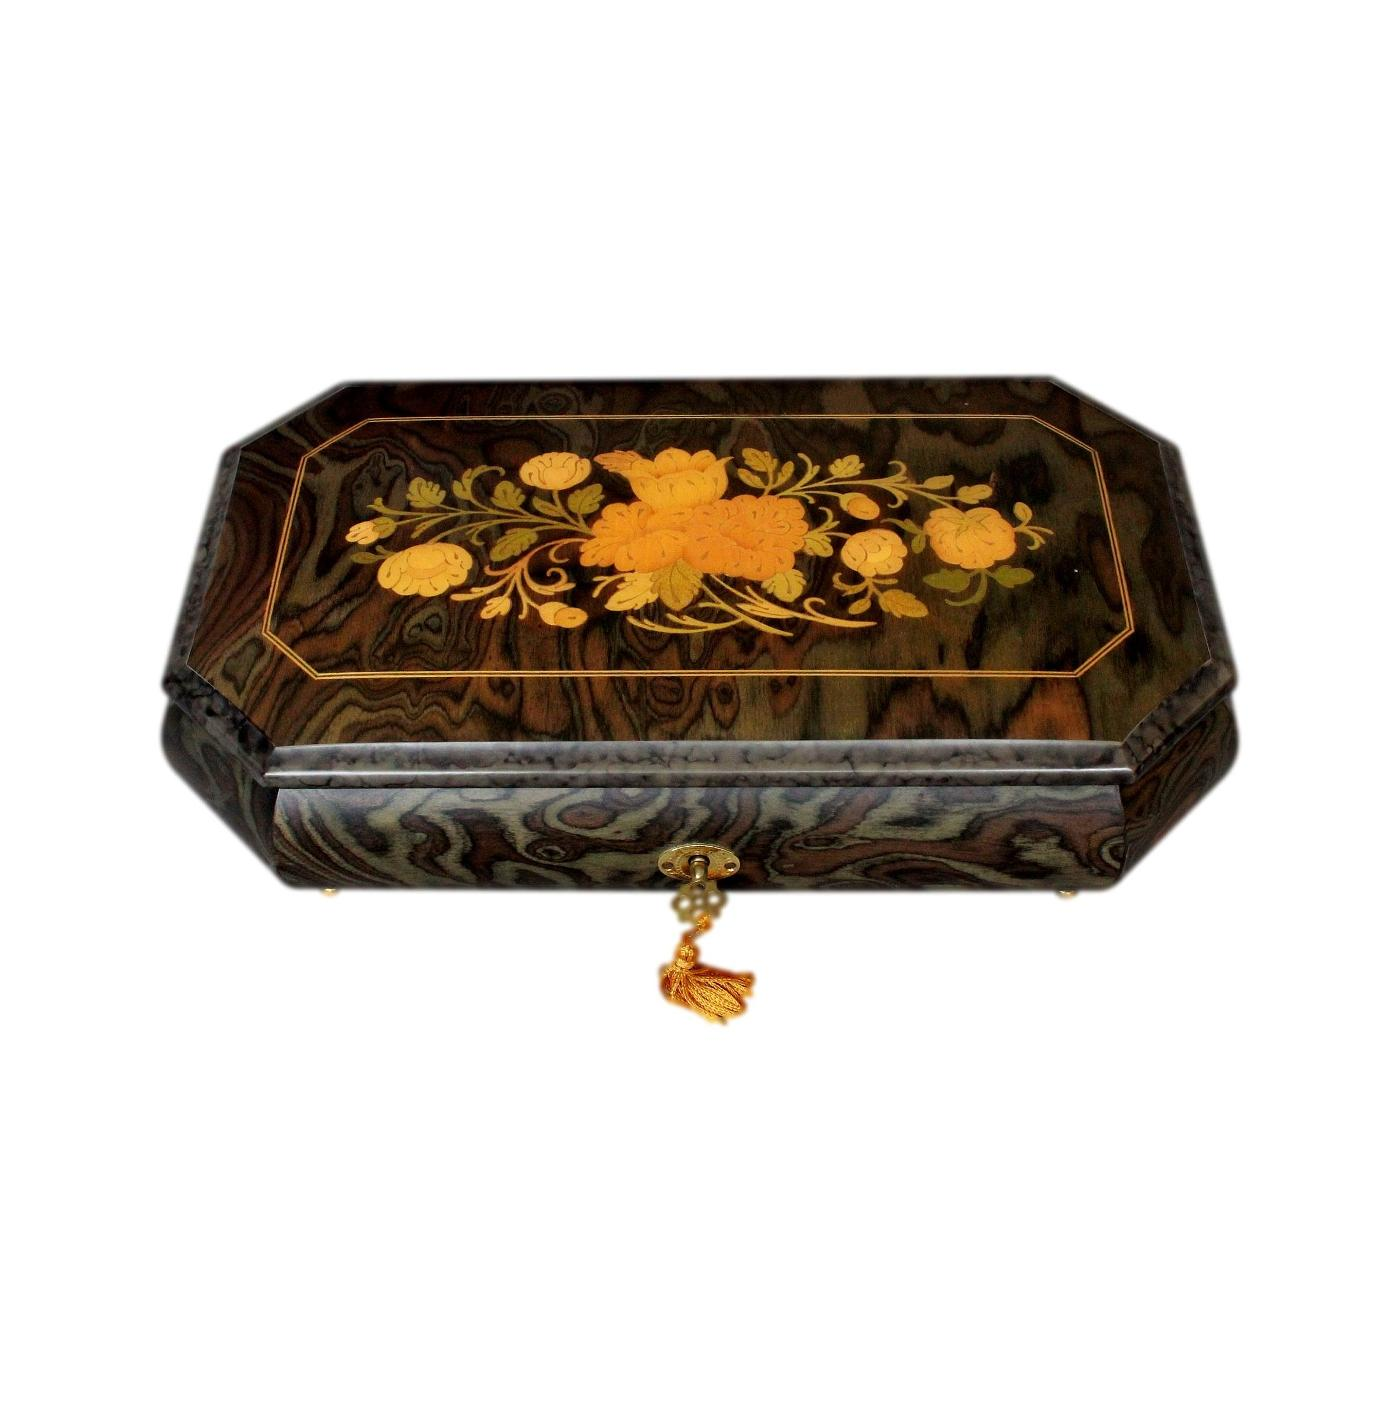 Flower Inlaid Sorrento Vintage Musical Jewellery Box